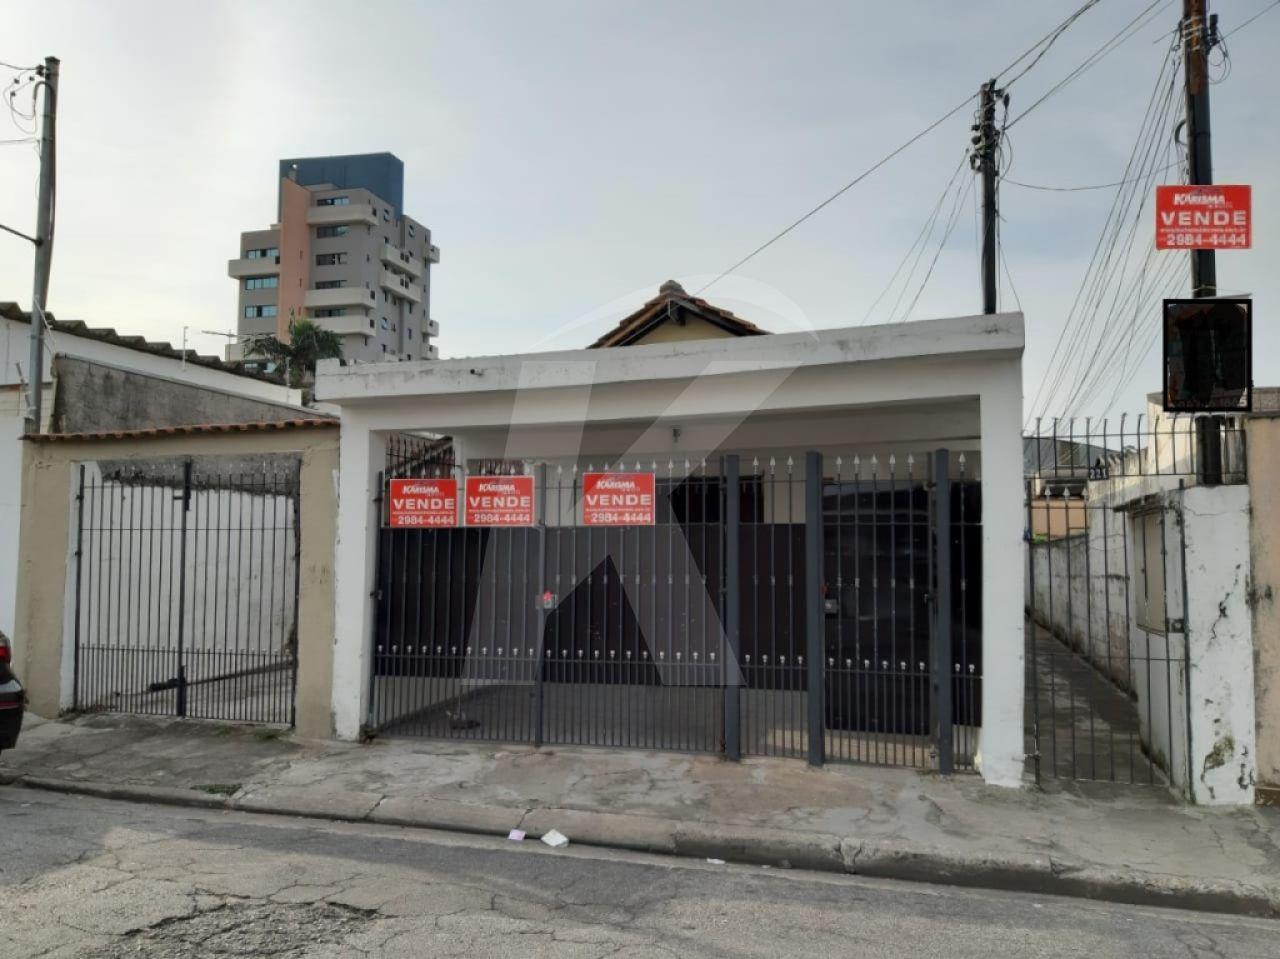 Comprar - Terreno - Vila Constança - 0 dormitórios.